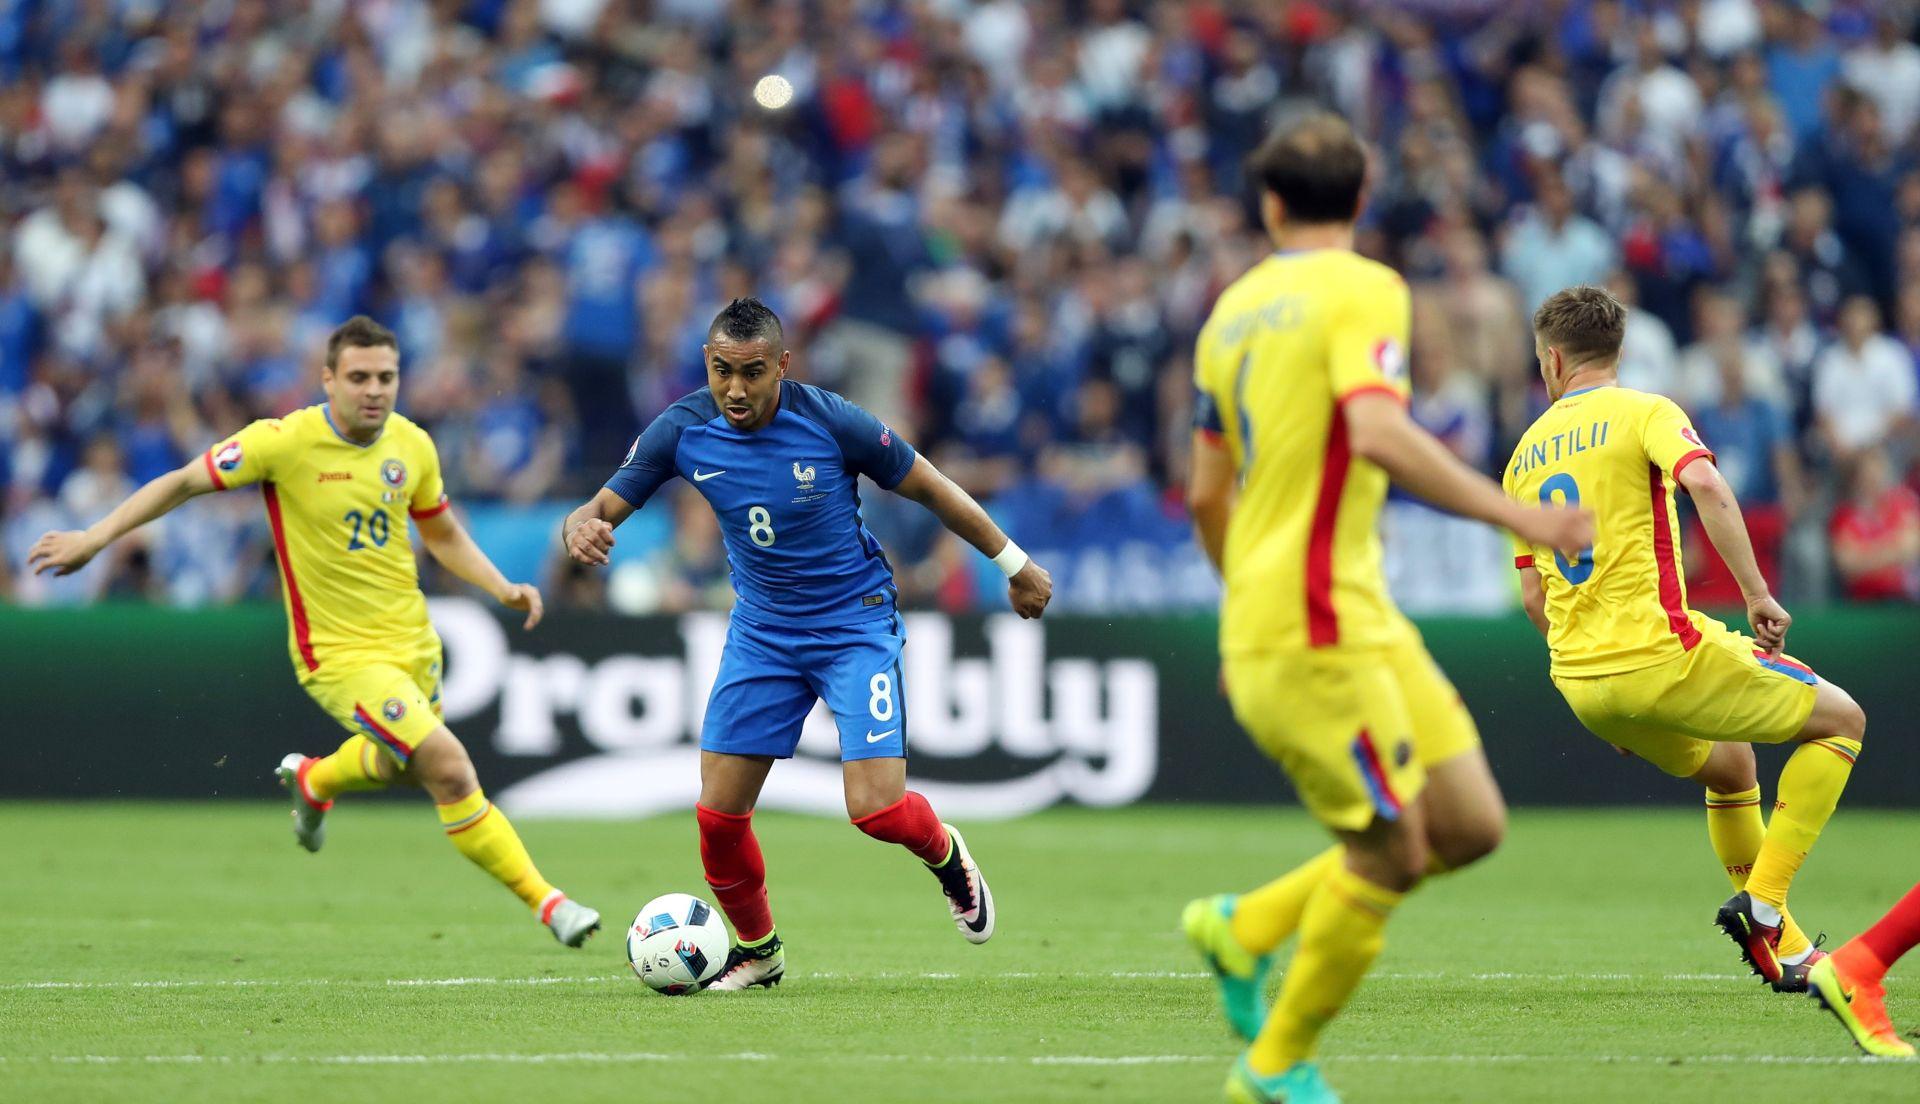 FOTO/VIDEO: FRANCUSKOJ TRI BODA! Dimitri Payet 'raspametio' Stade de France